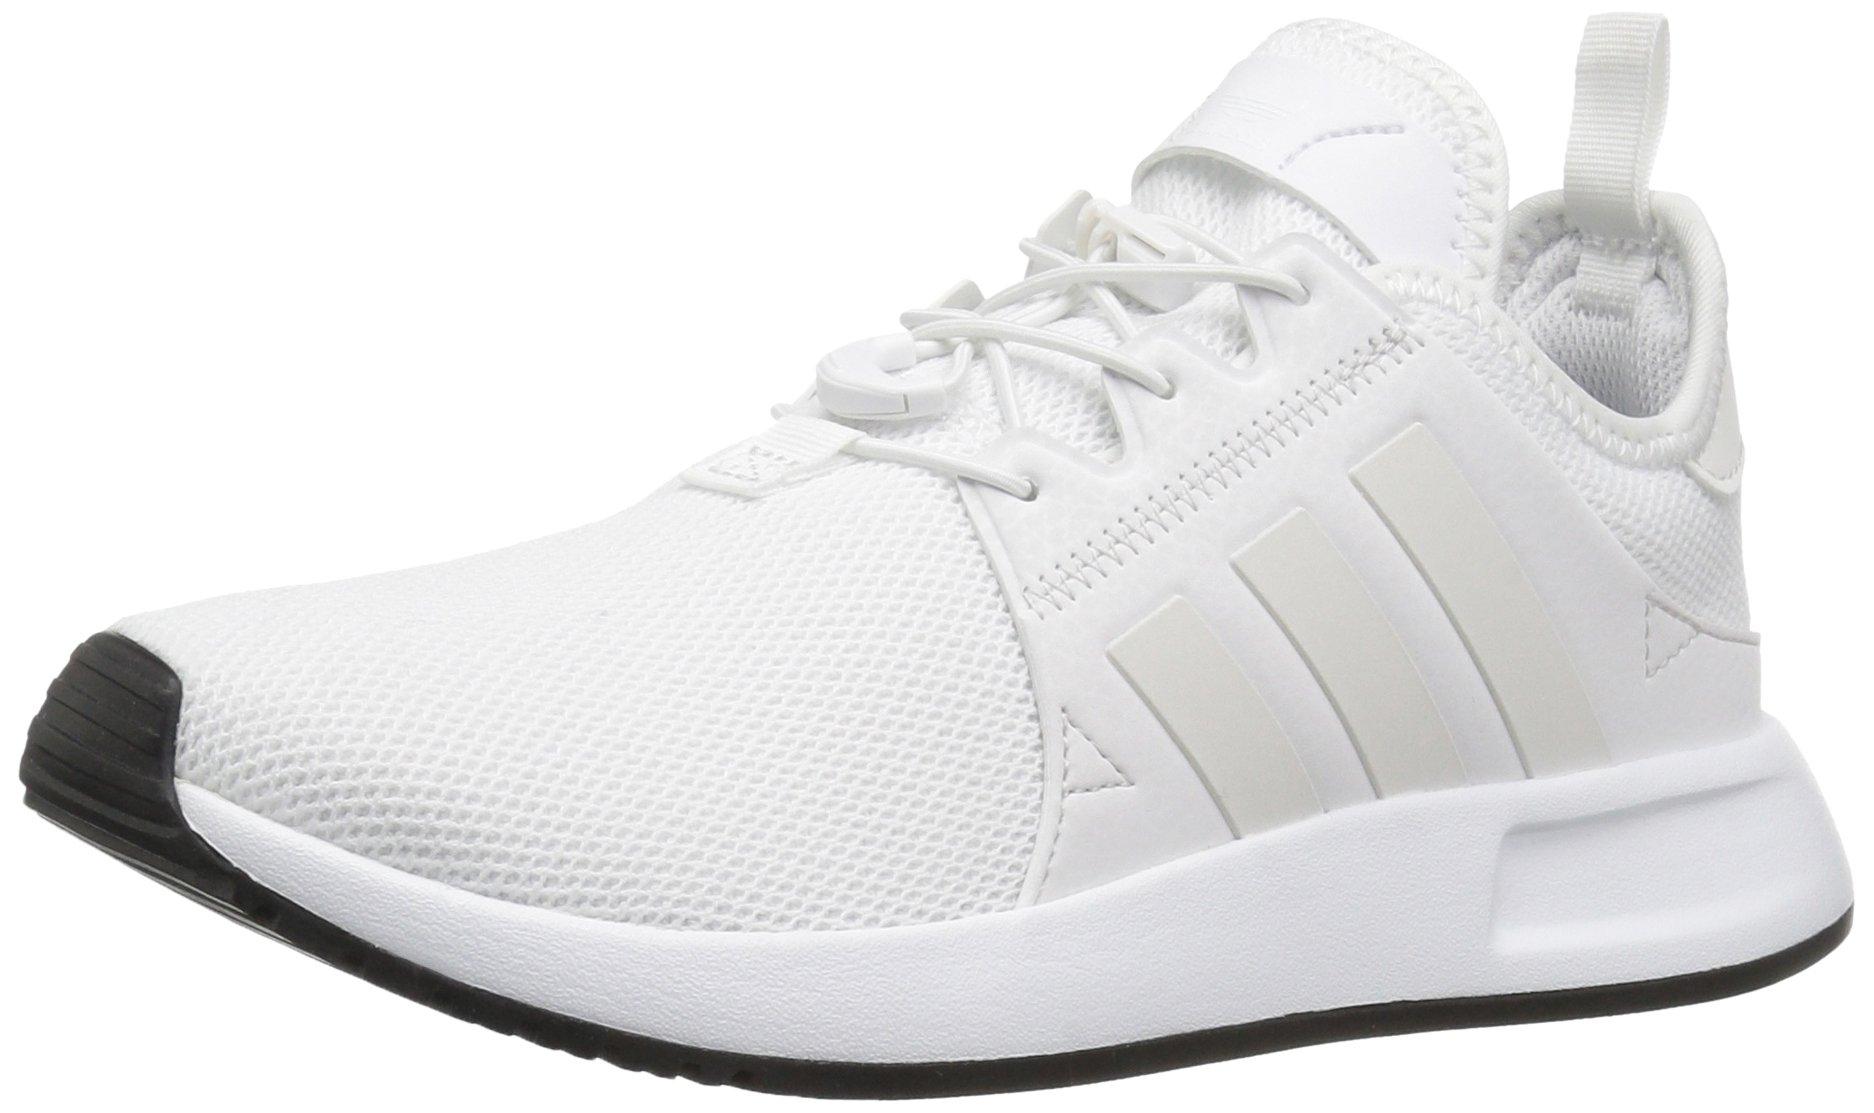 Galleon Adidas Originals X_PLR J Running Shoe, Vintage